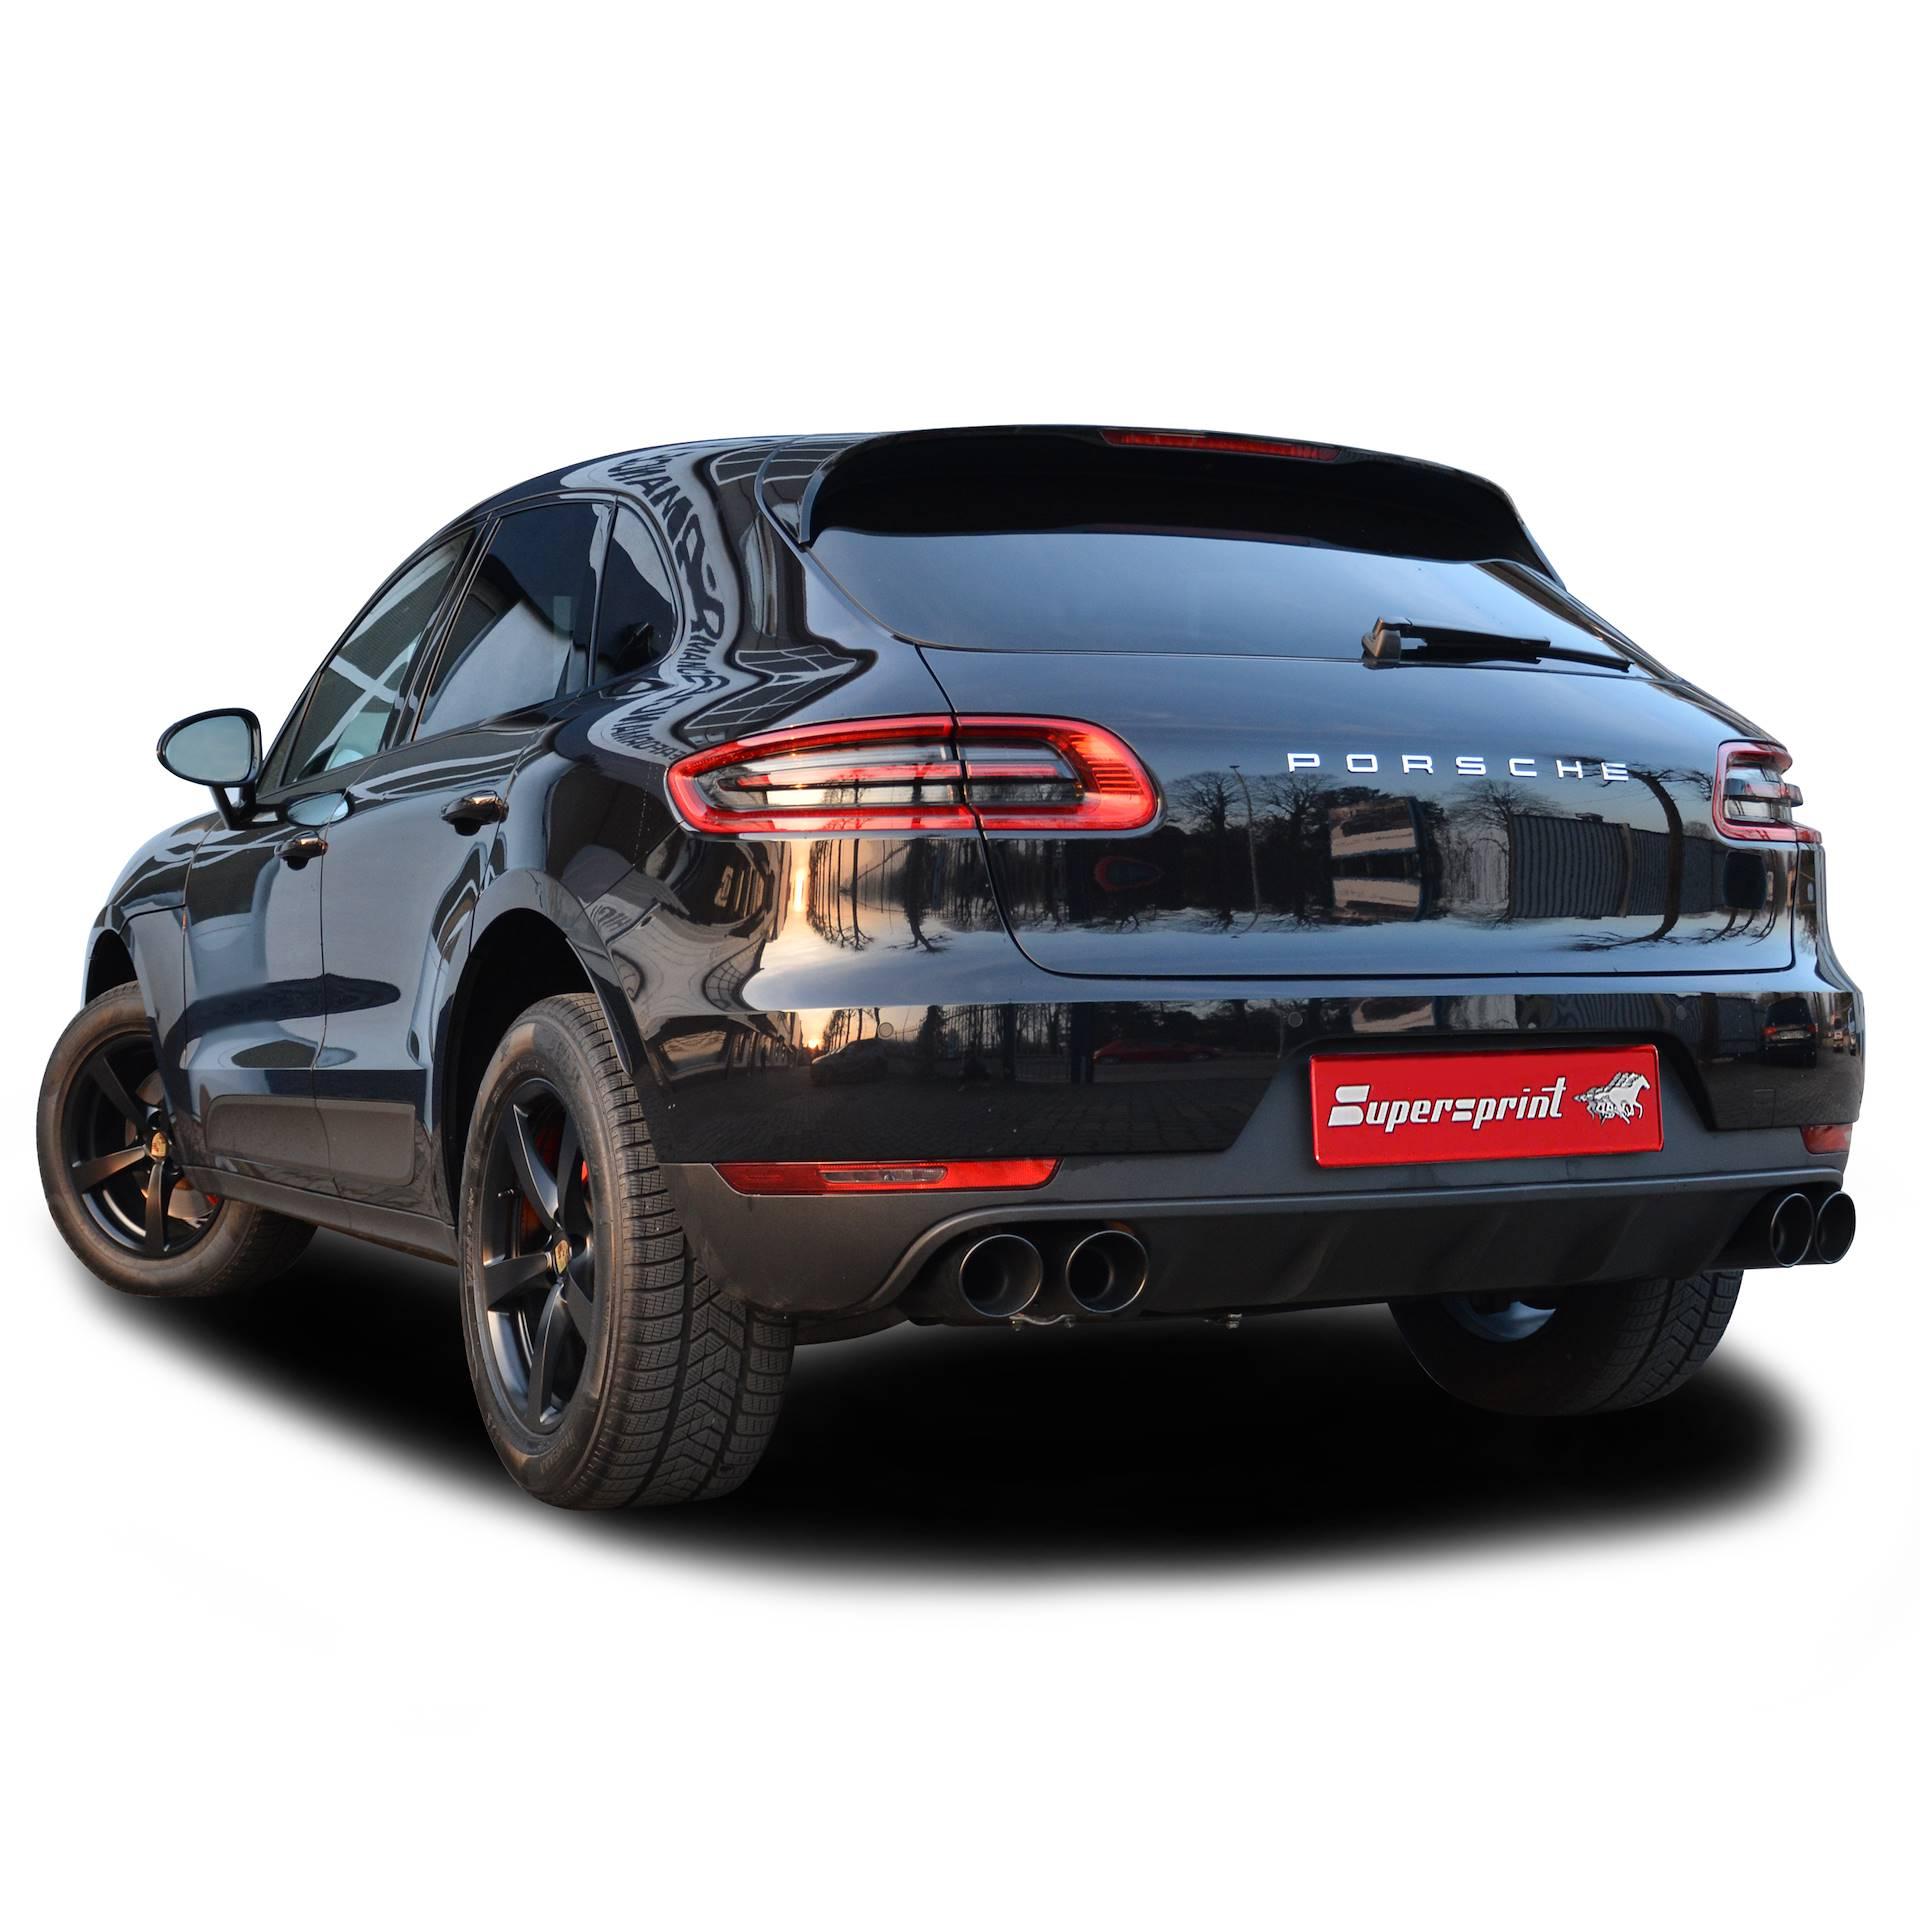 Porsche Macan: Performance Exhaust Systems, Performance Racing Exhaust